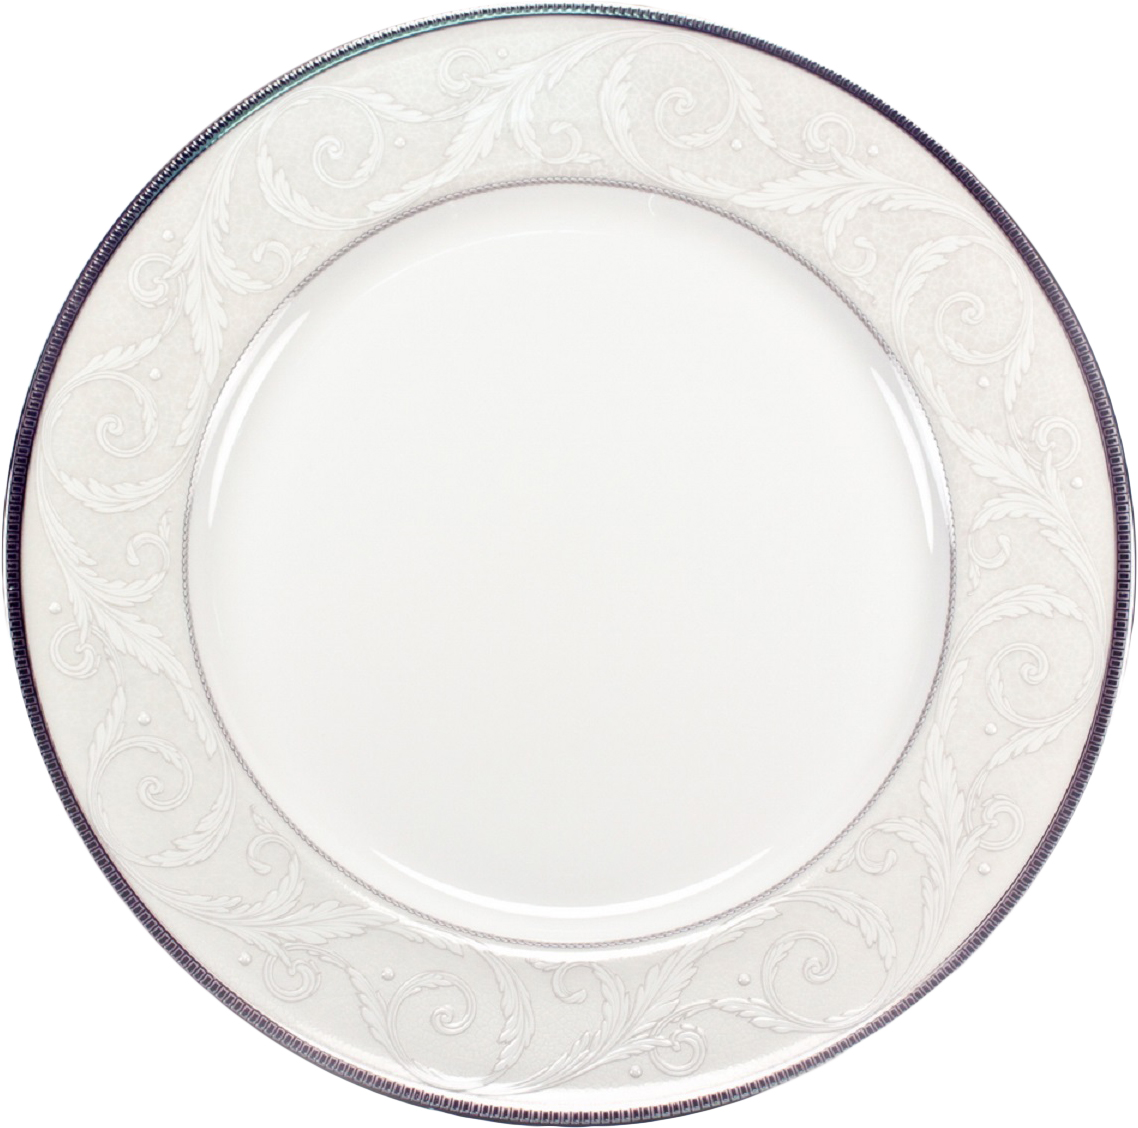 Набор тарелок десертных Narumi Ноктюрн, диаметр 23 см, 6 шт